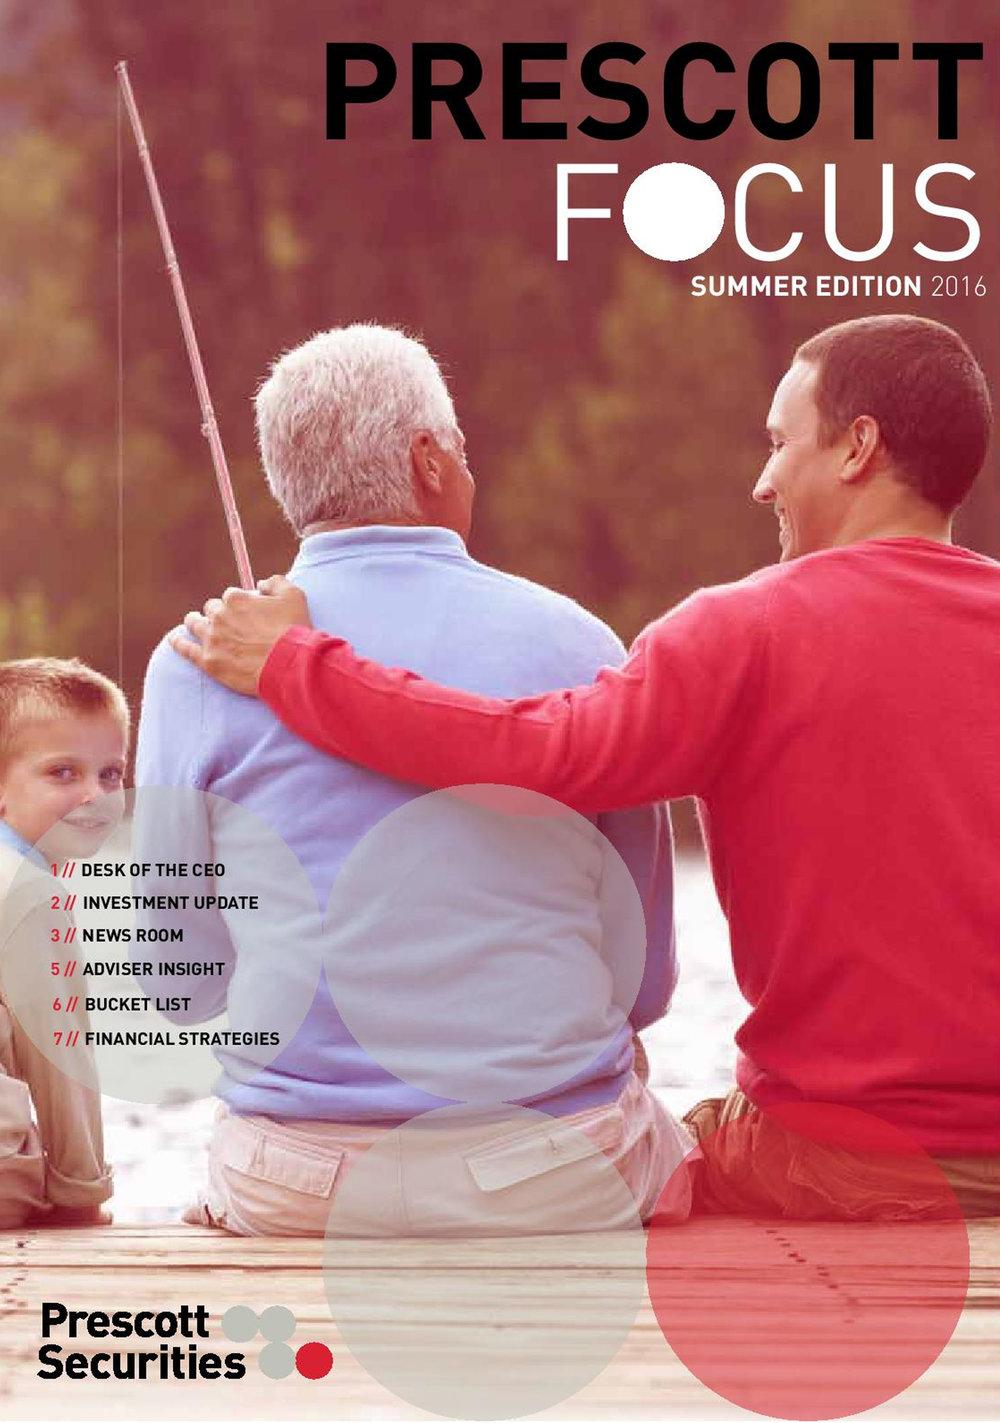 Prescott-Focus-Summer